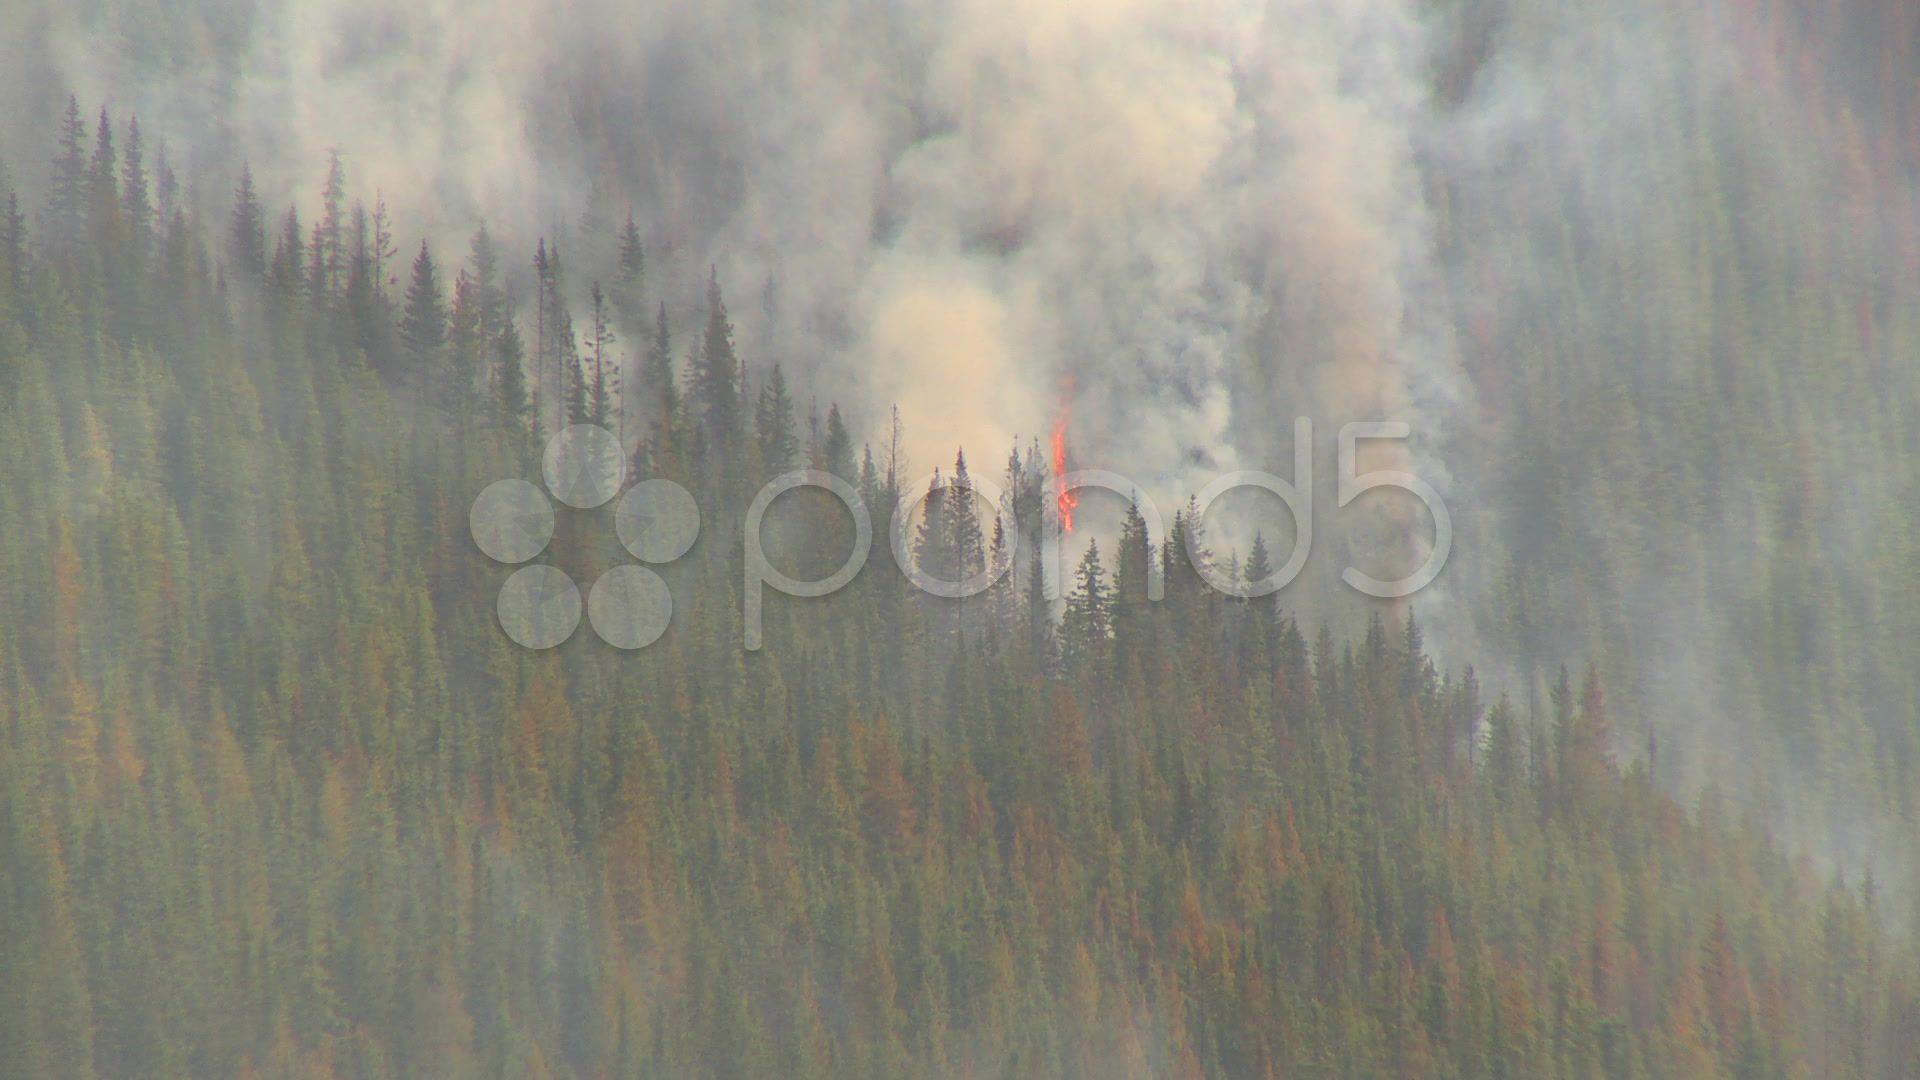 Mountain forest fire, Mt Buller Forest fire, Smoke